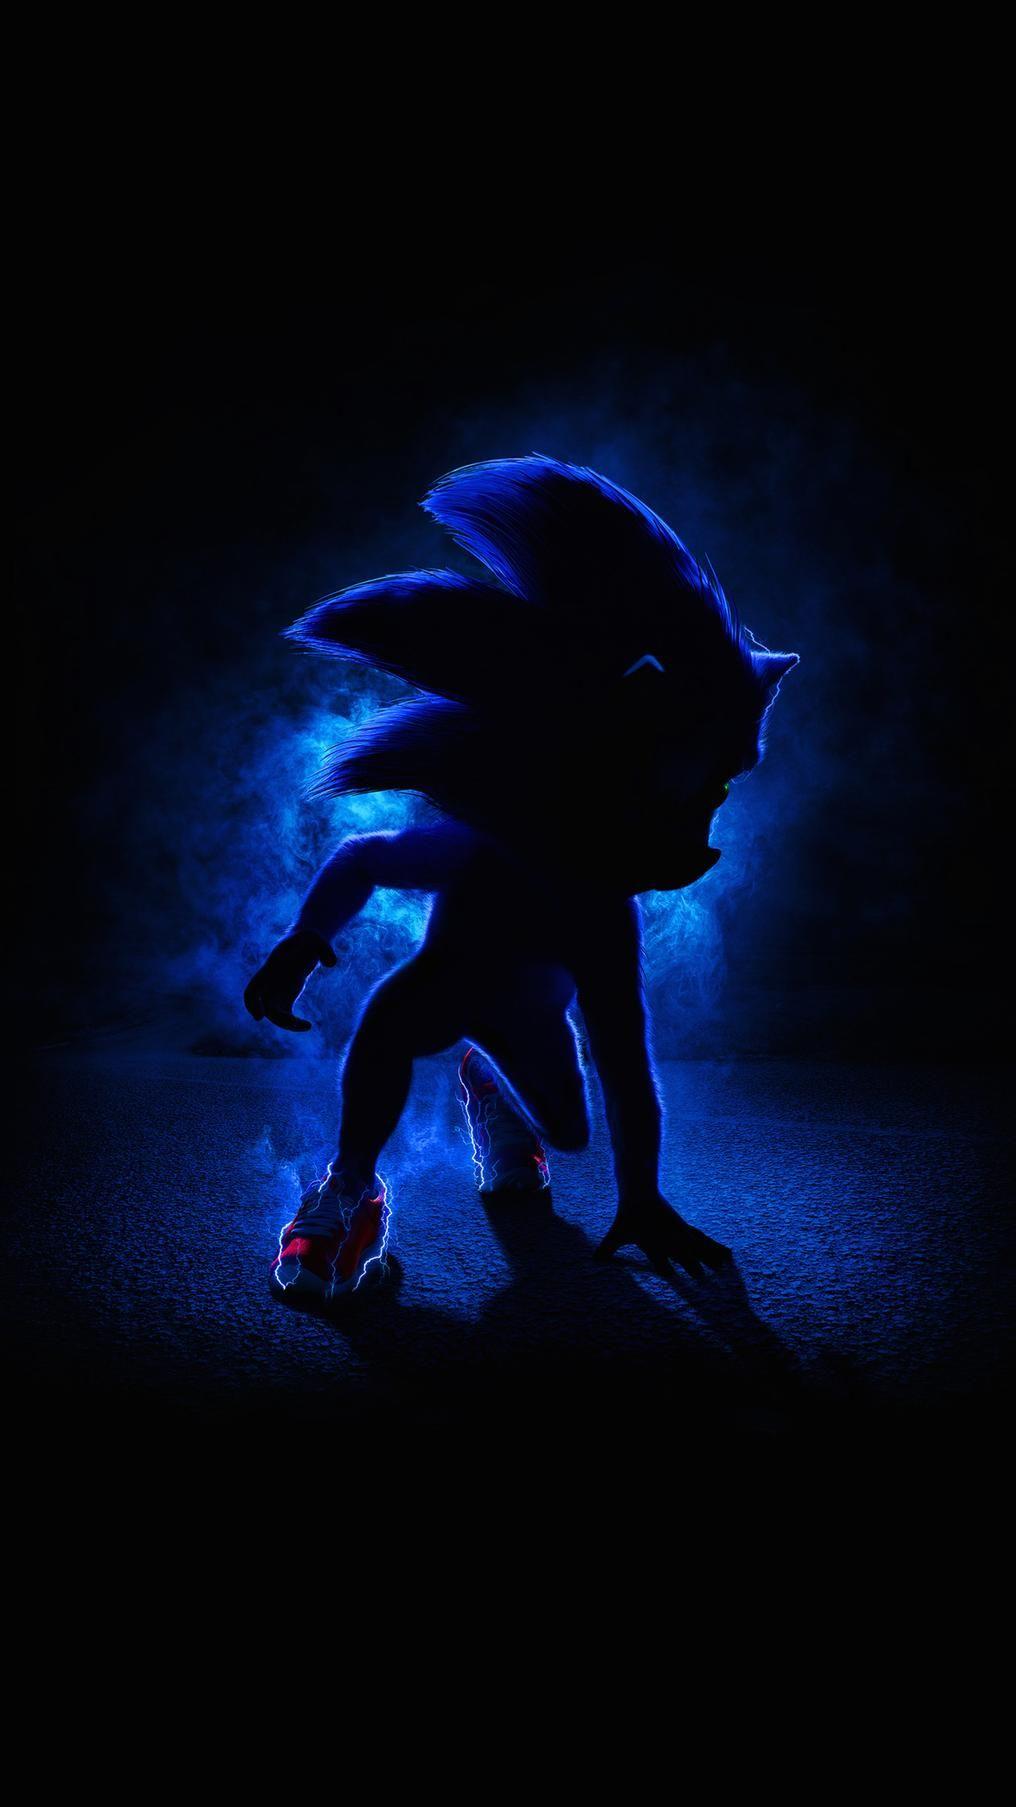 Sonic the Hedgehog 2020 Phone Wallpaper Hedgehog movie Sonic 1016x1807